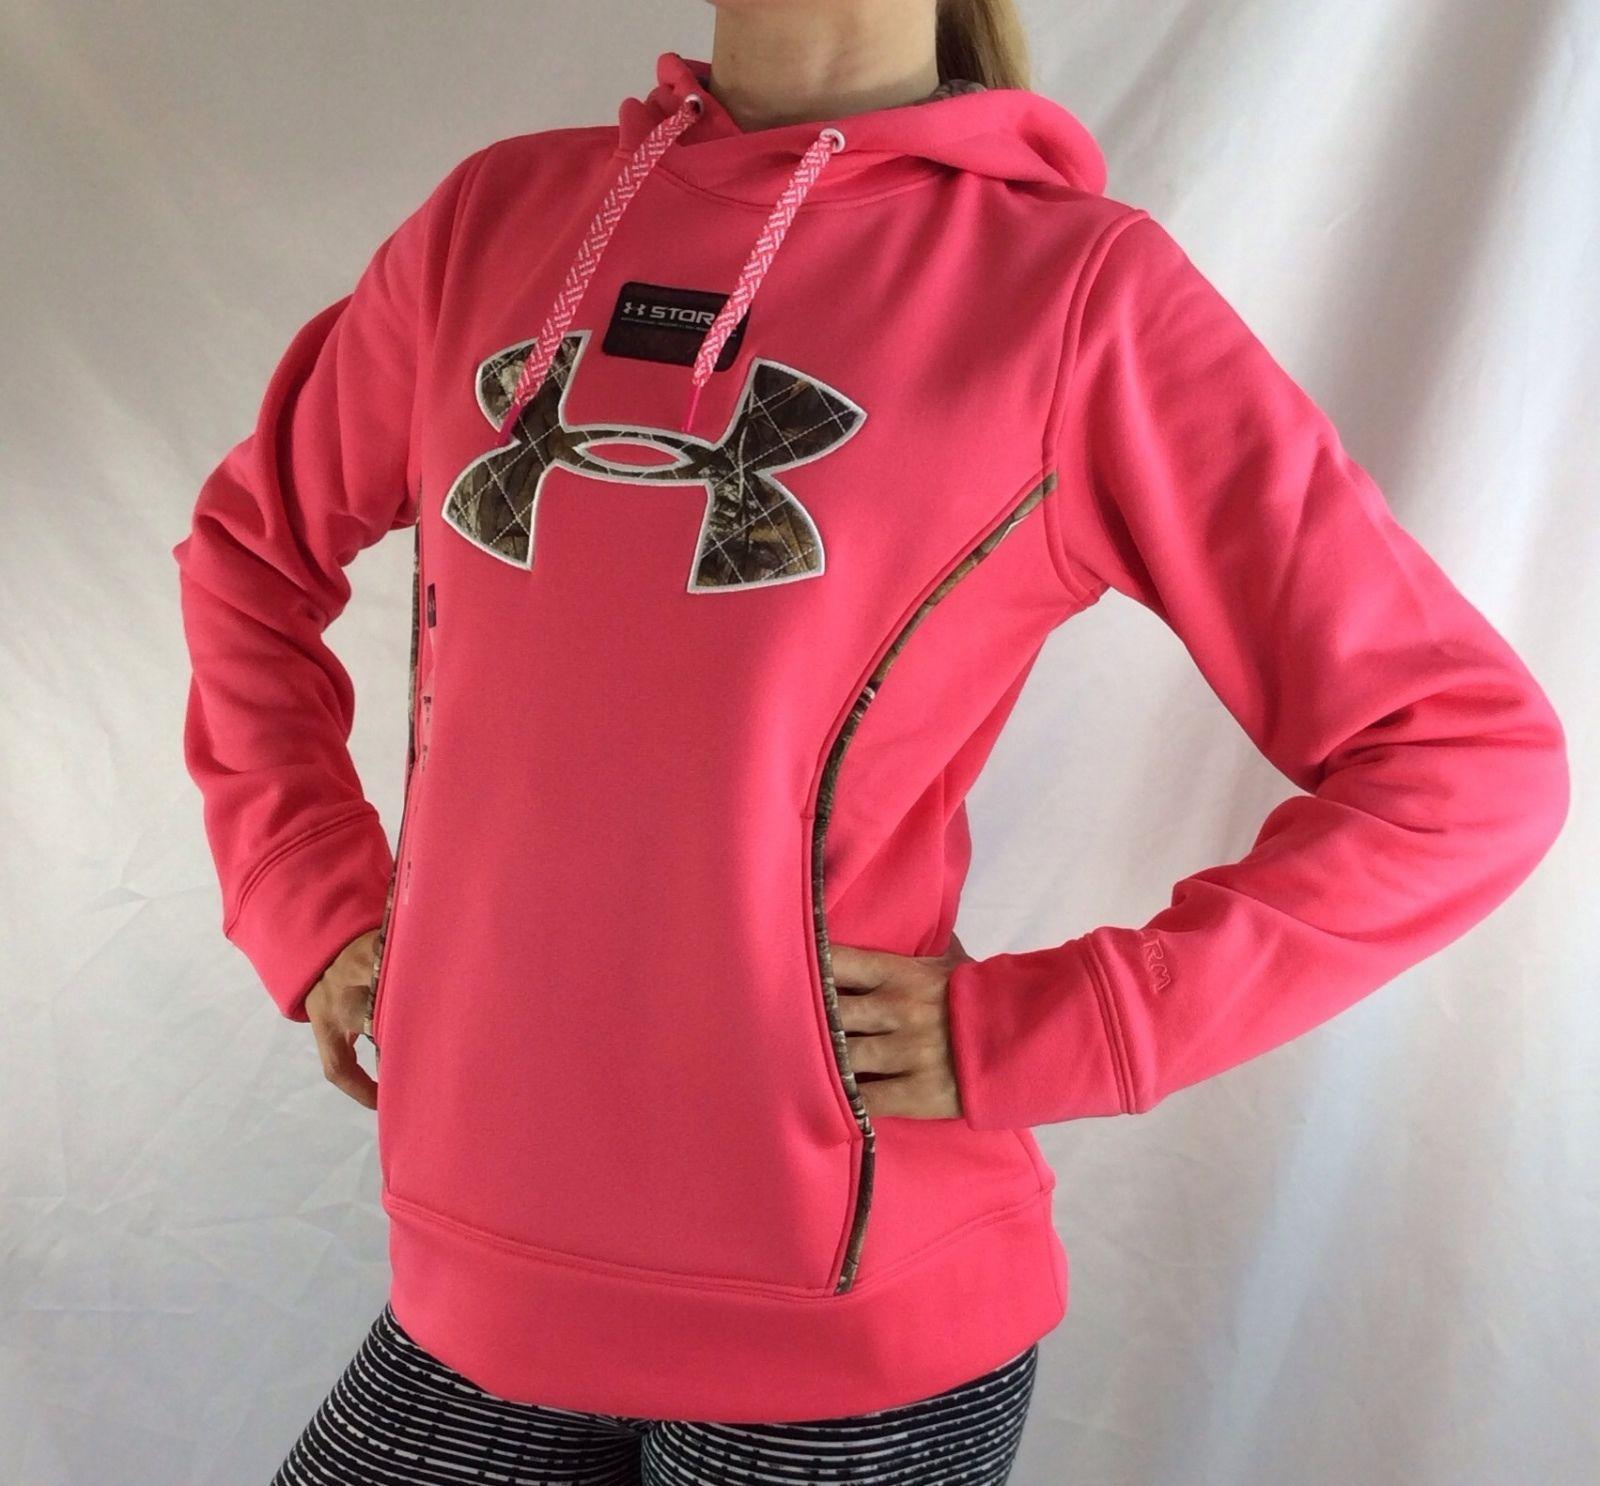 Under Armour Women's Fleece Sweater Hoodie Pink Camo Size Xl ...